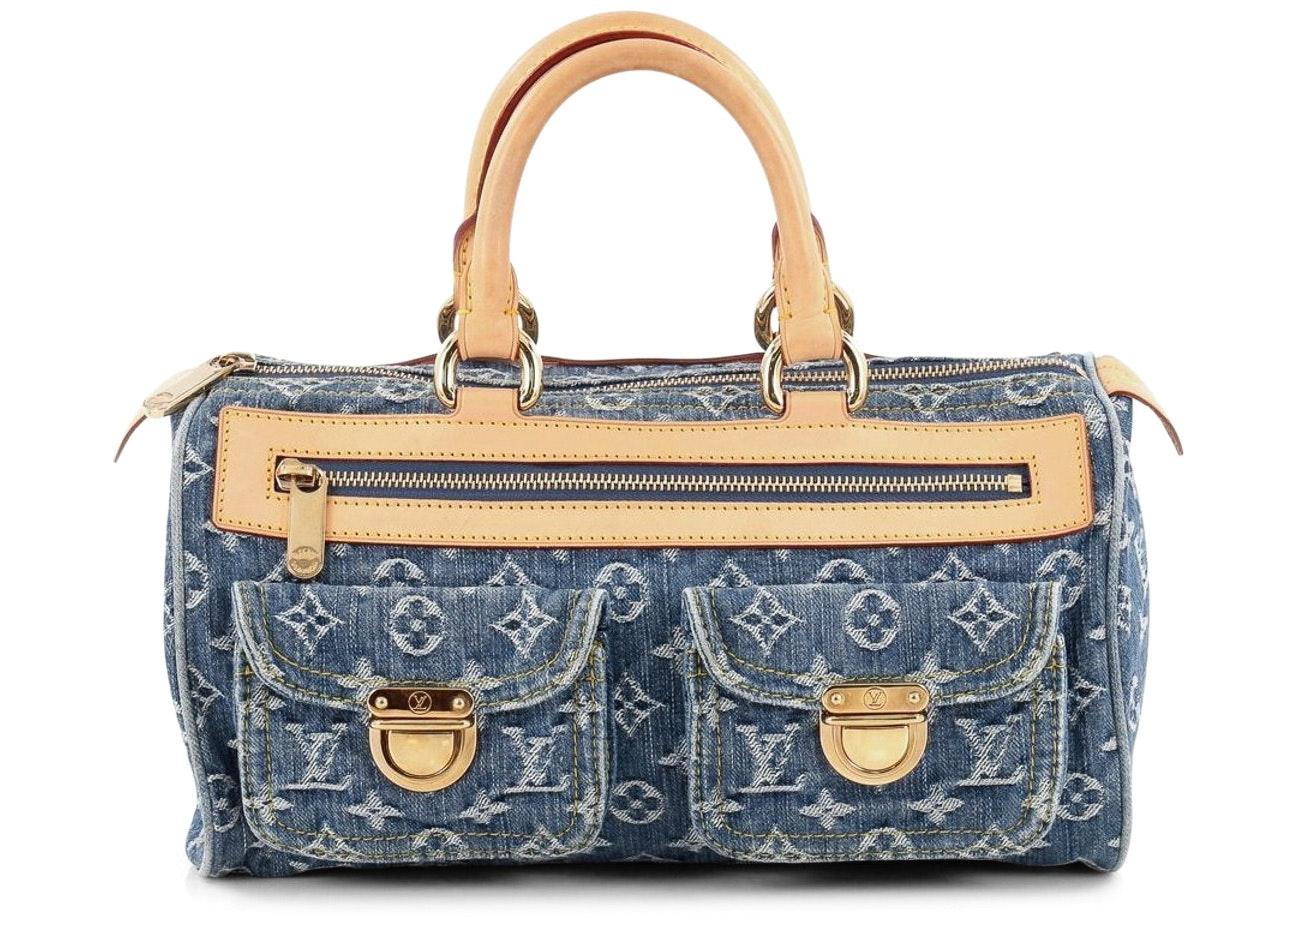 Louis Vuitton Speedy Neo Monogram Blue